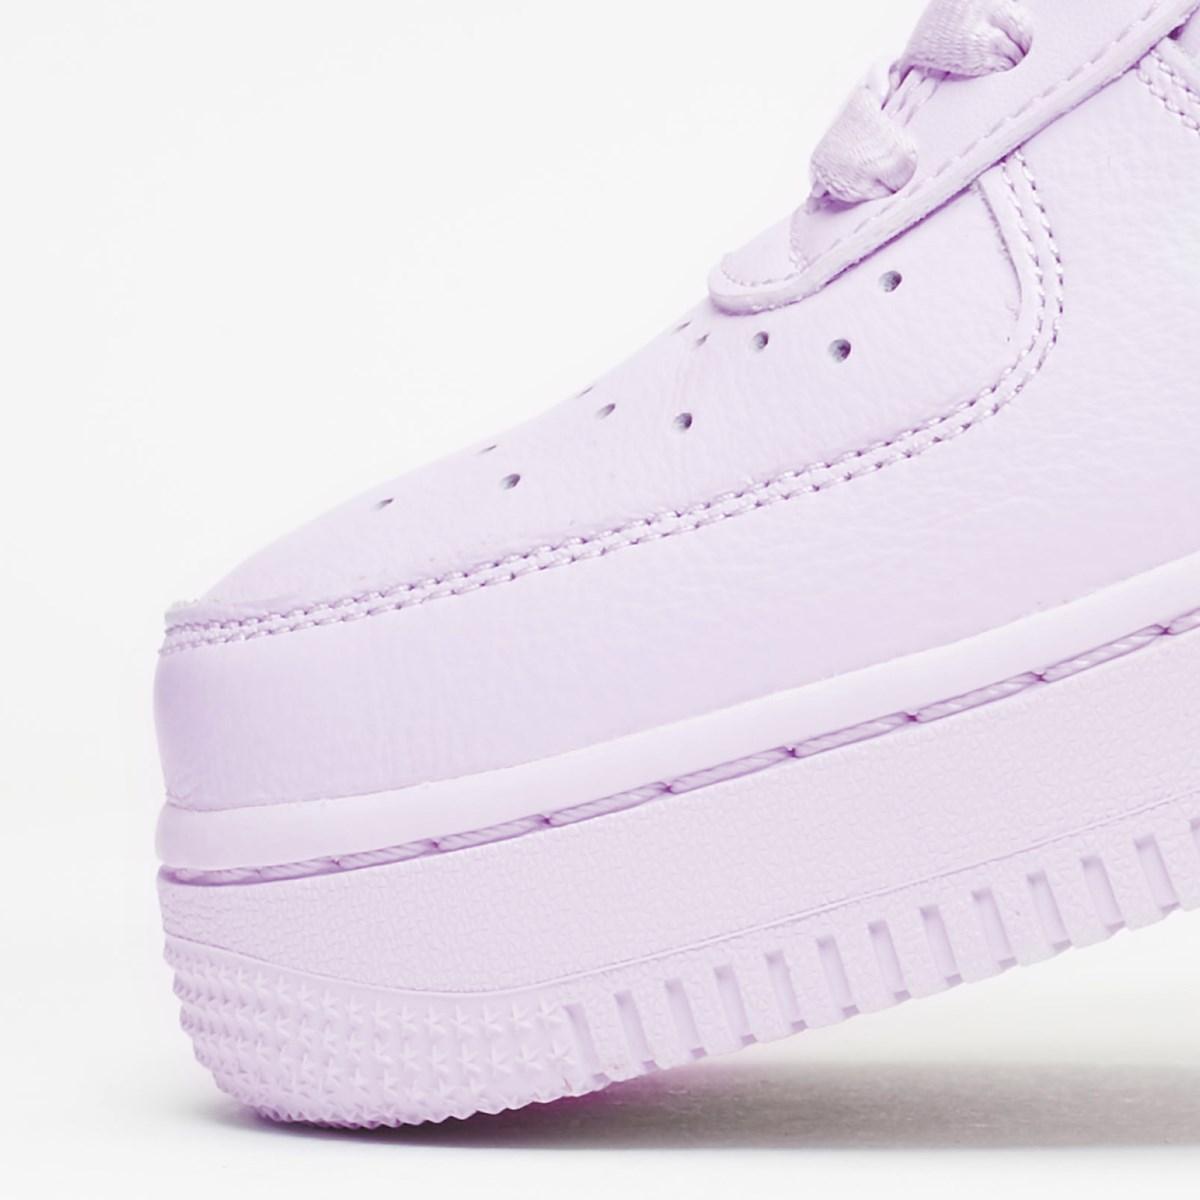 Nike Wmns Air Force 1 Low Cj9700 500 Sneakersnstuff